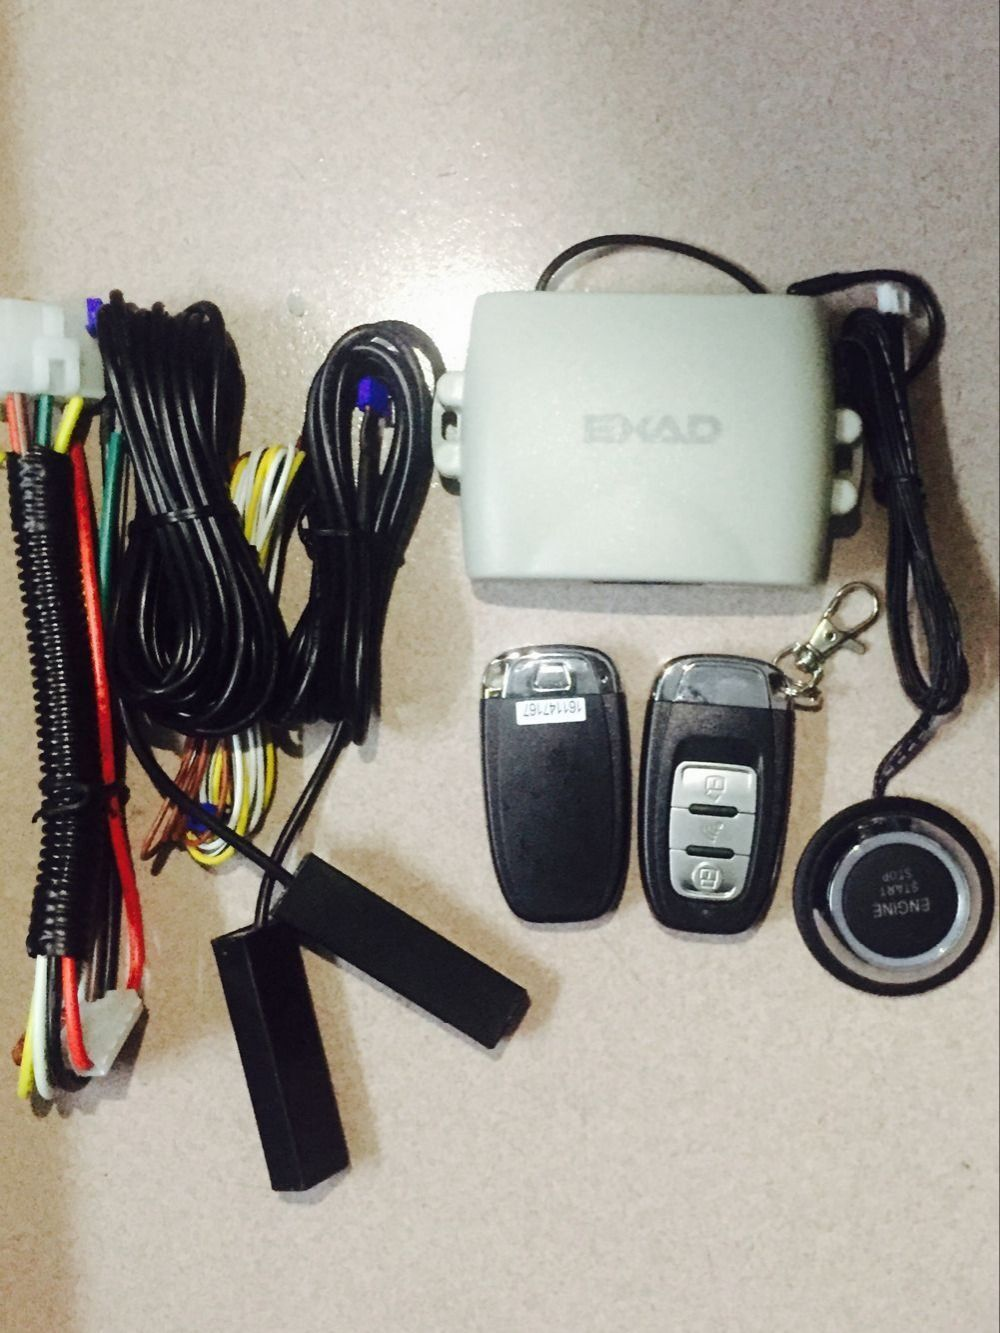 PKE Smart Car Alarm System With Passive Auto Lock/ Unlock Car Door Keyless push Button Start Stop,Remote Start Stop For Toyota